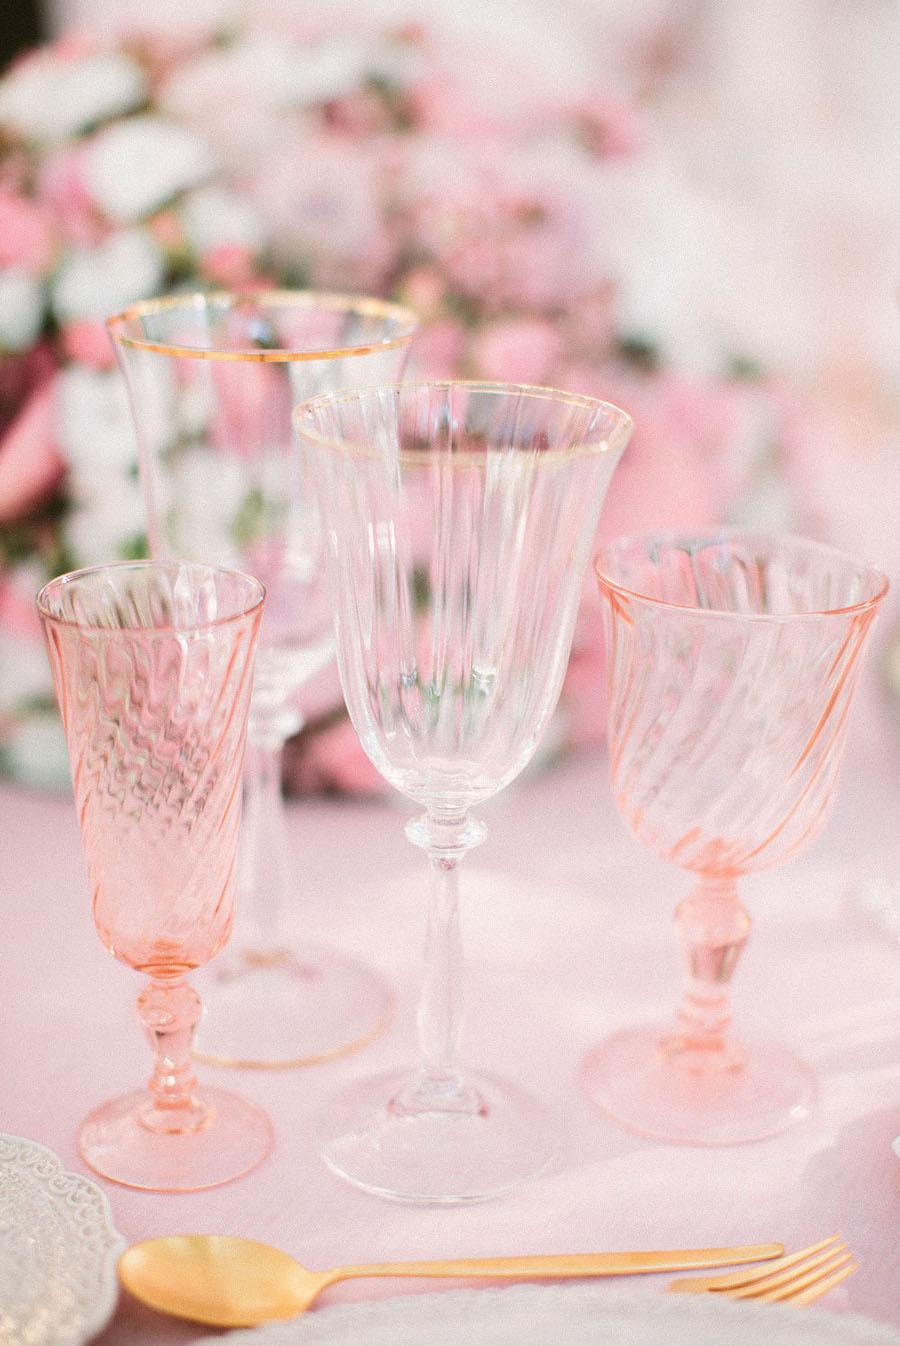 saya-photography-wedding-pink-japanese-spain-8.jpg